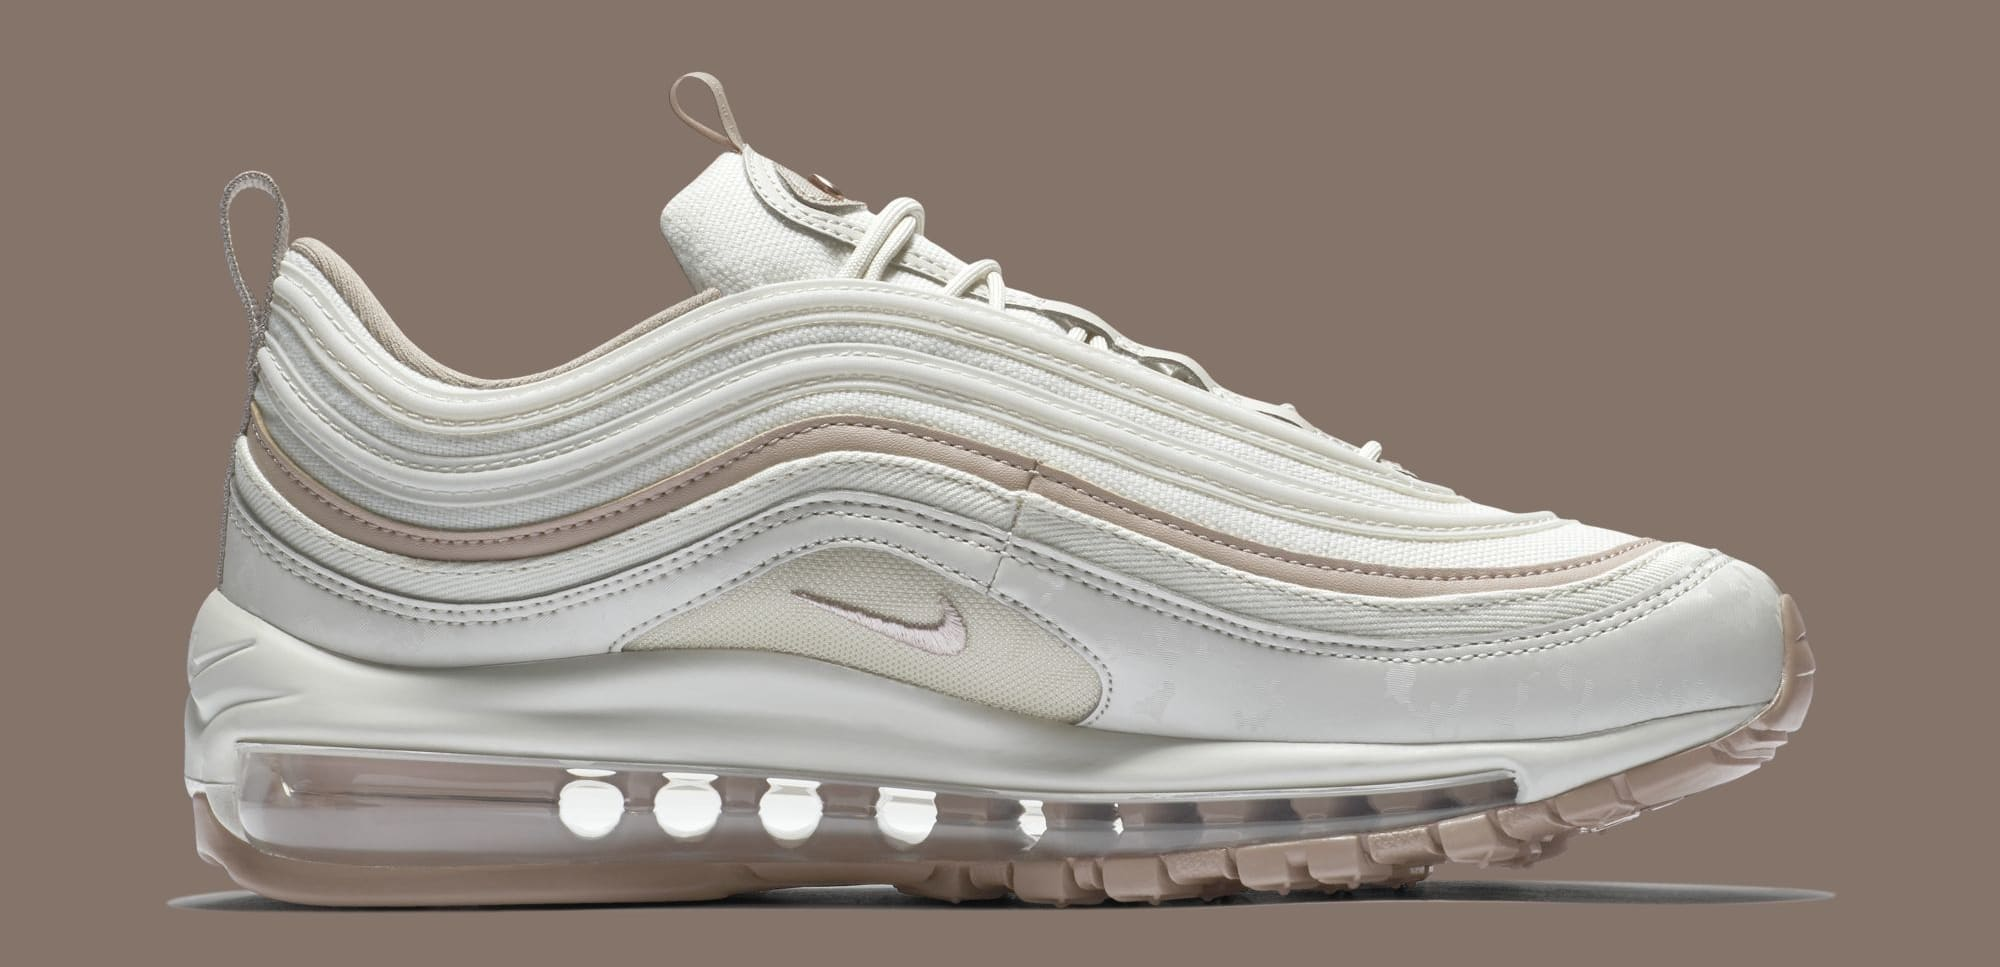 02b74e642d Image via Nike Nike WMNS Air Max 97 Premium 'Light Bone/Diffused Taupe/Sepia  Stone'